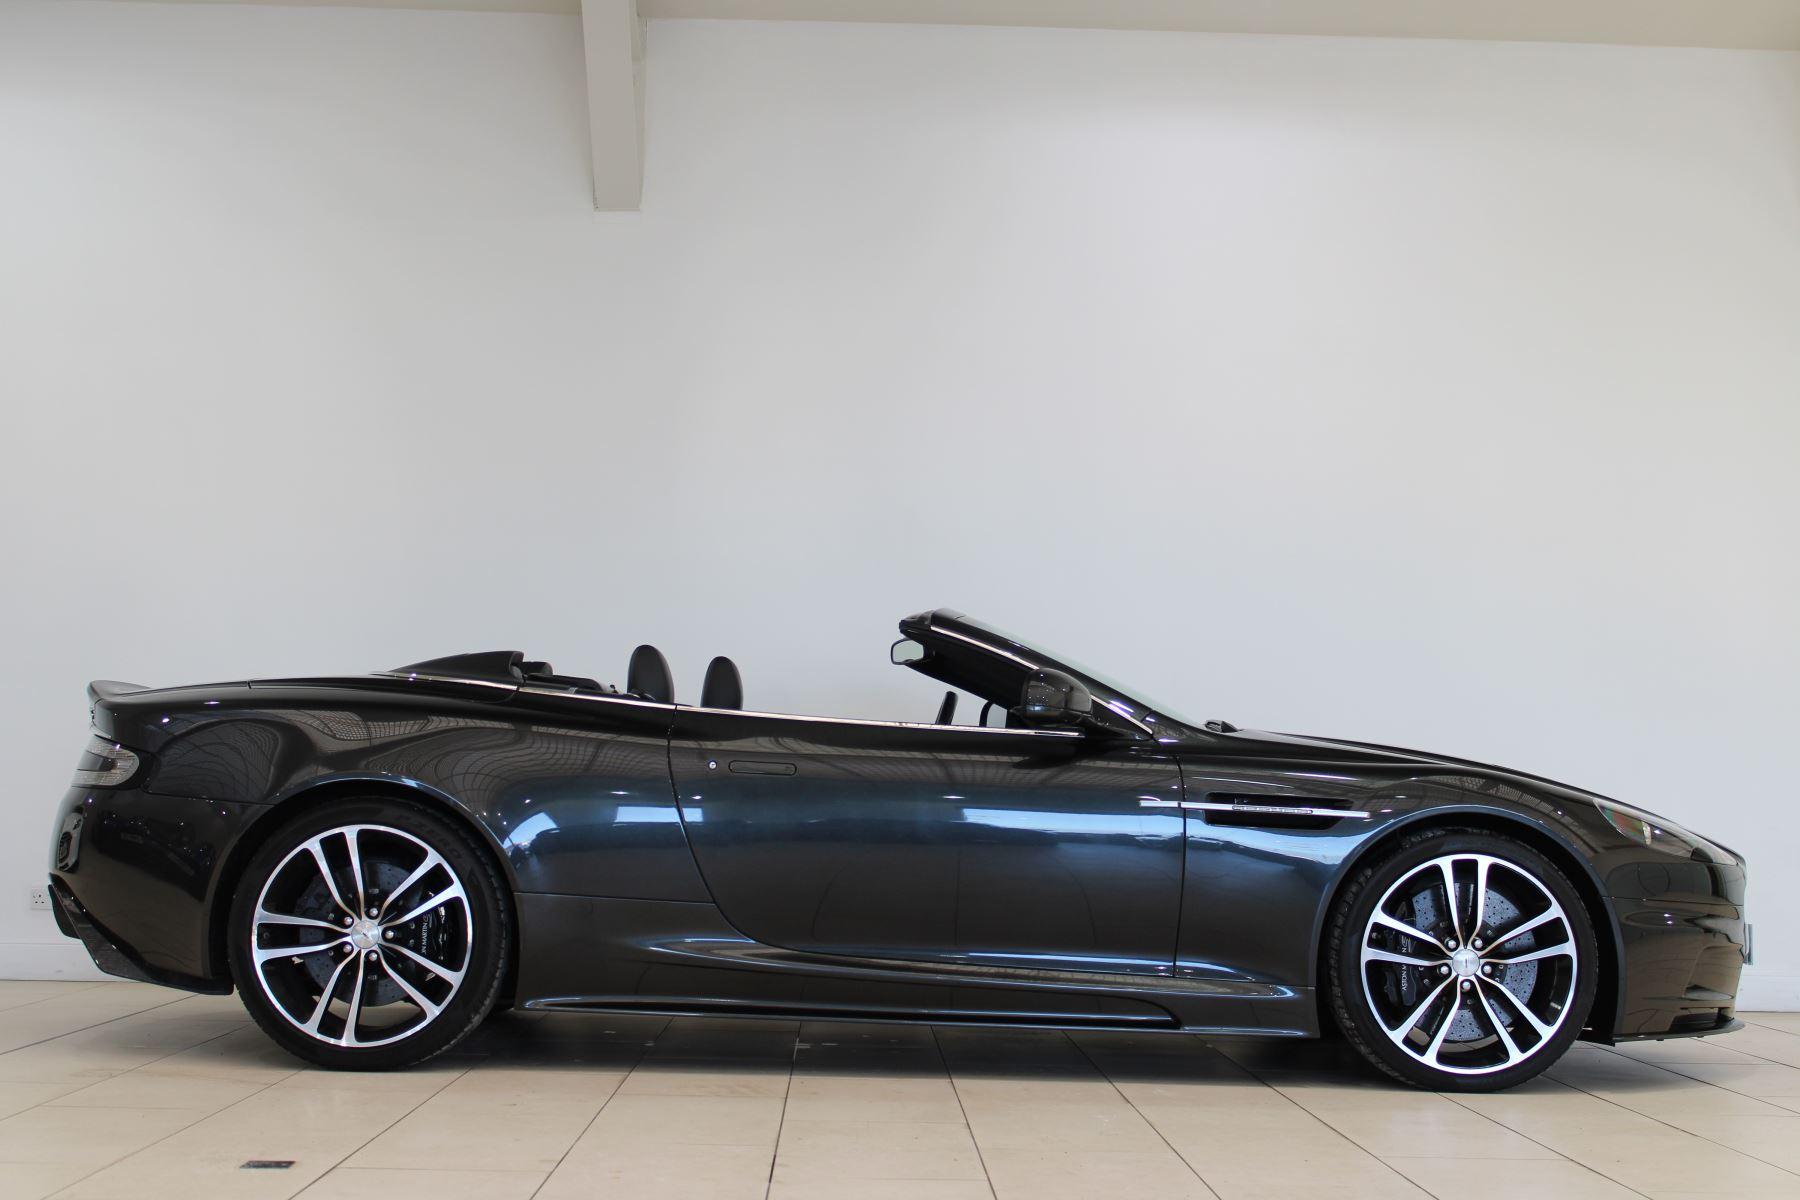 Aston Martin DBS CARBON V12 2dr Volante Touchtronic image 5